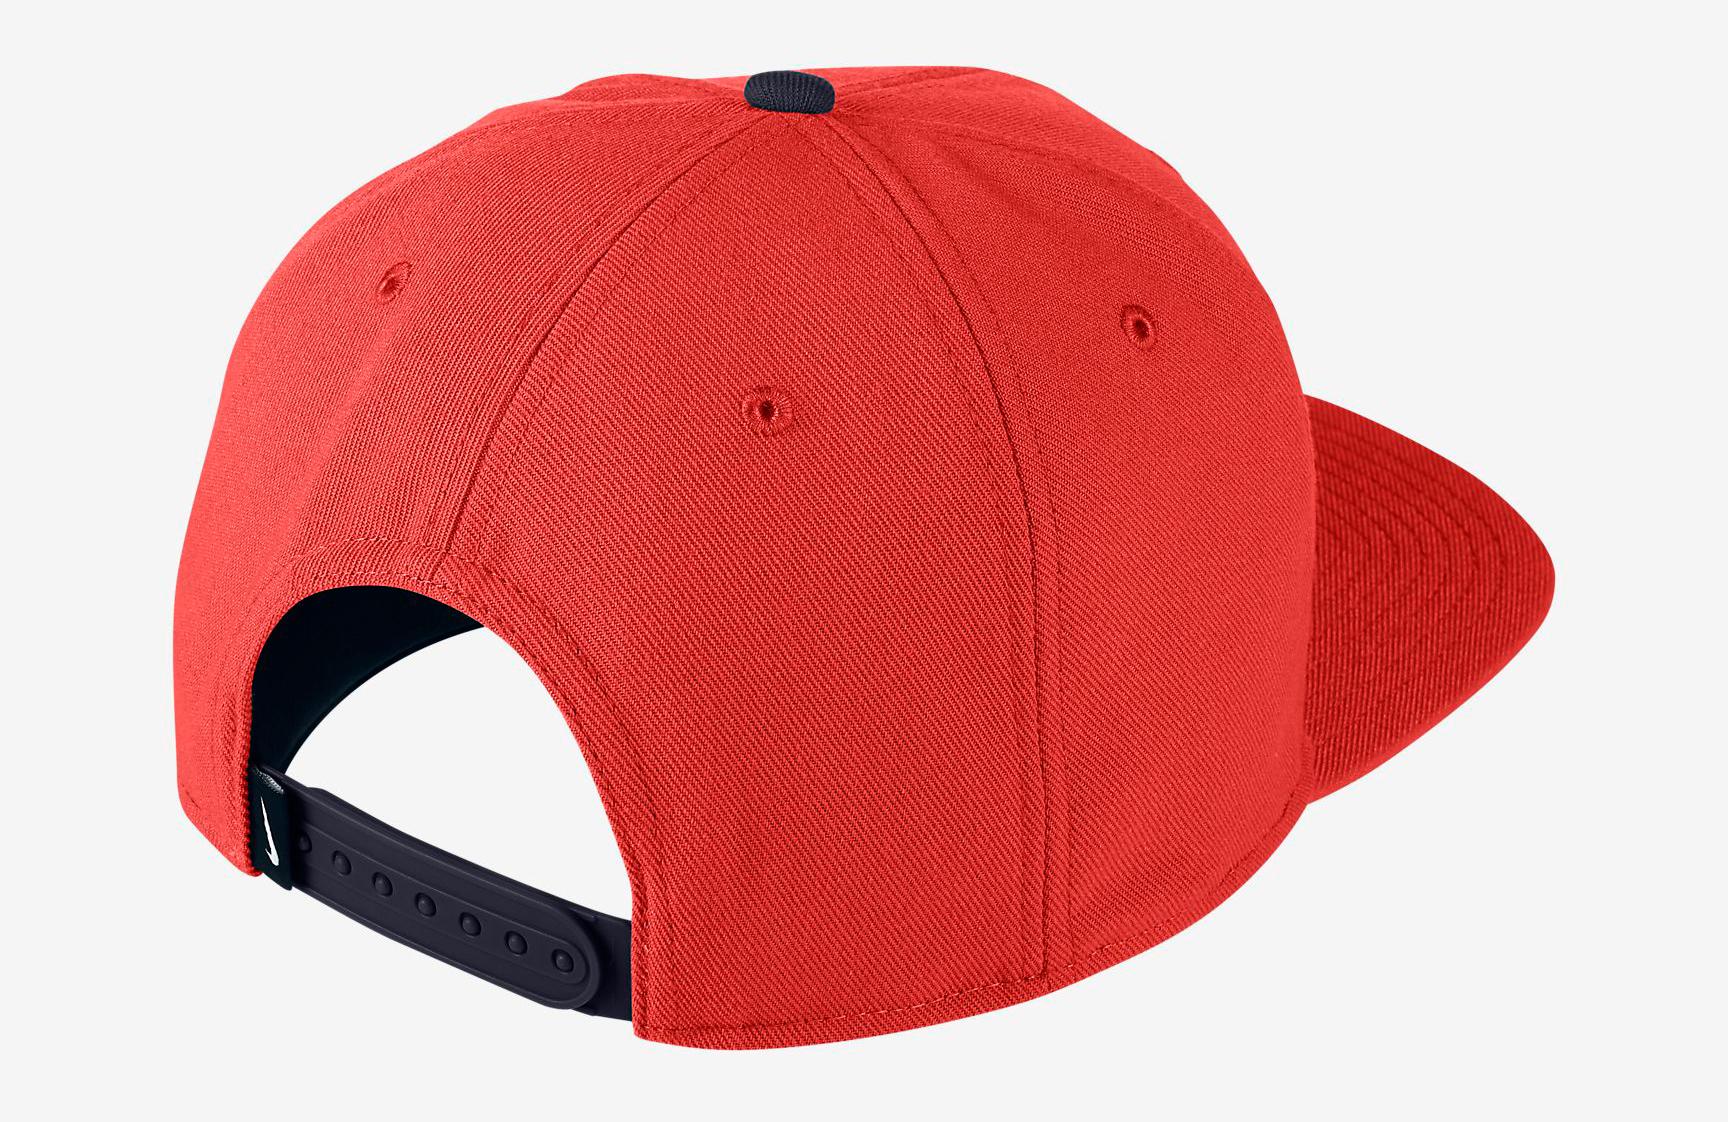 habanero-red-foamposite-nike-snapback-cap-2